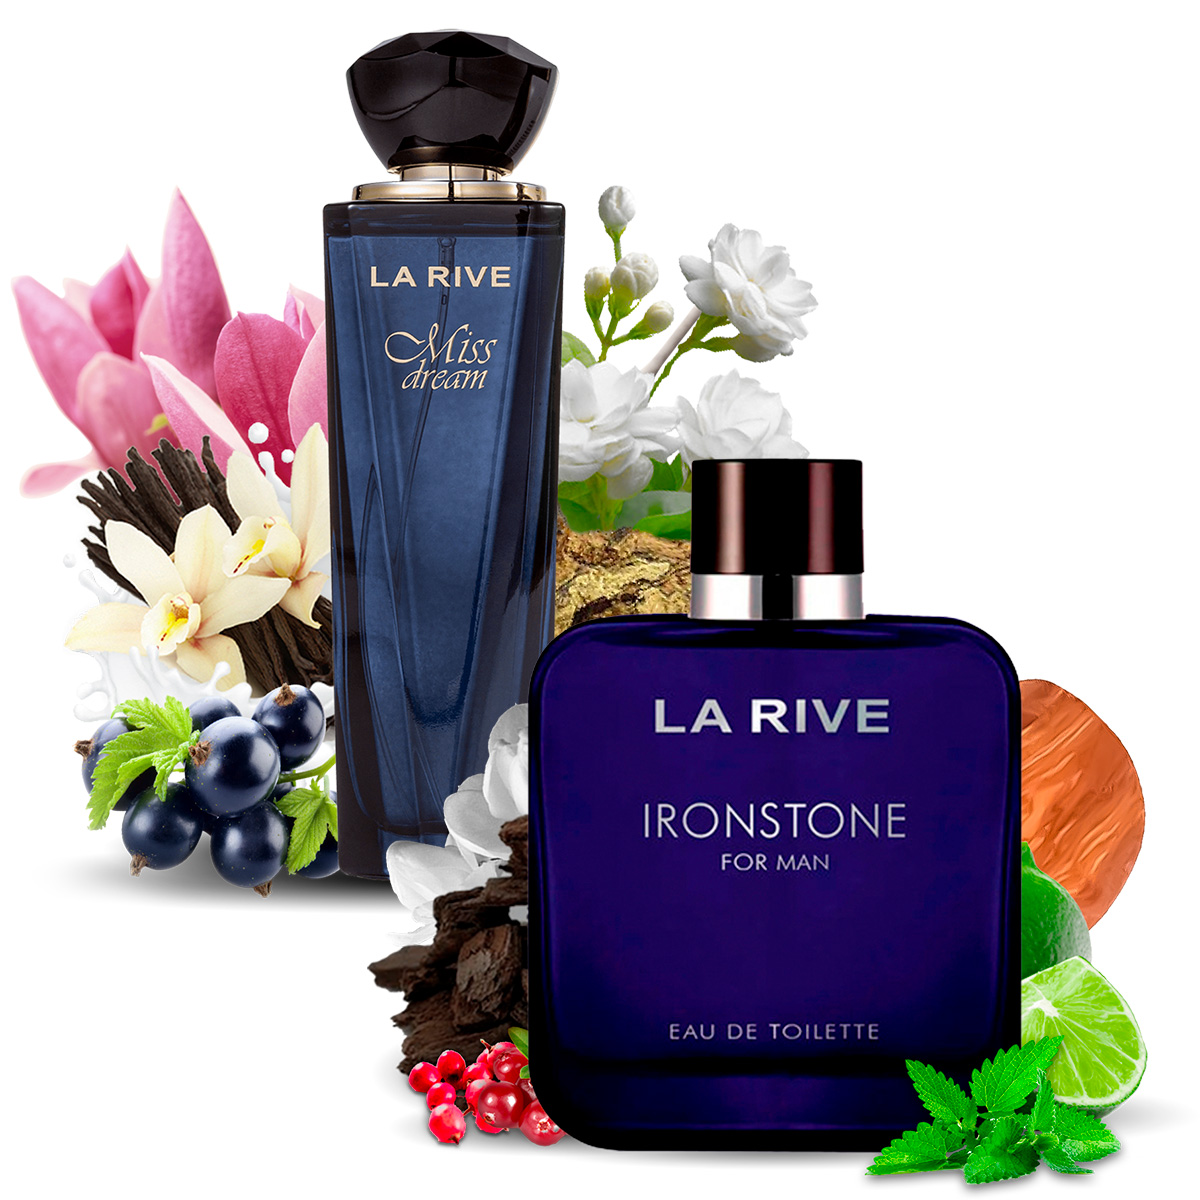 Kit 2 Perfumes Importados Miss Dream e Ironstone La Rive